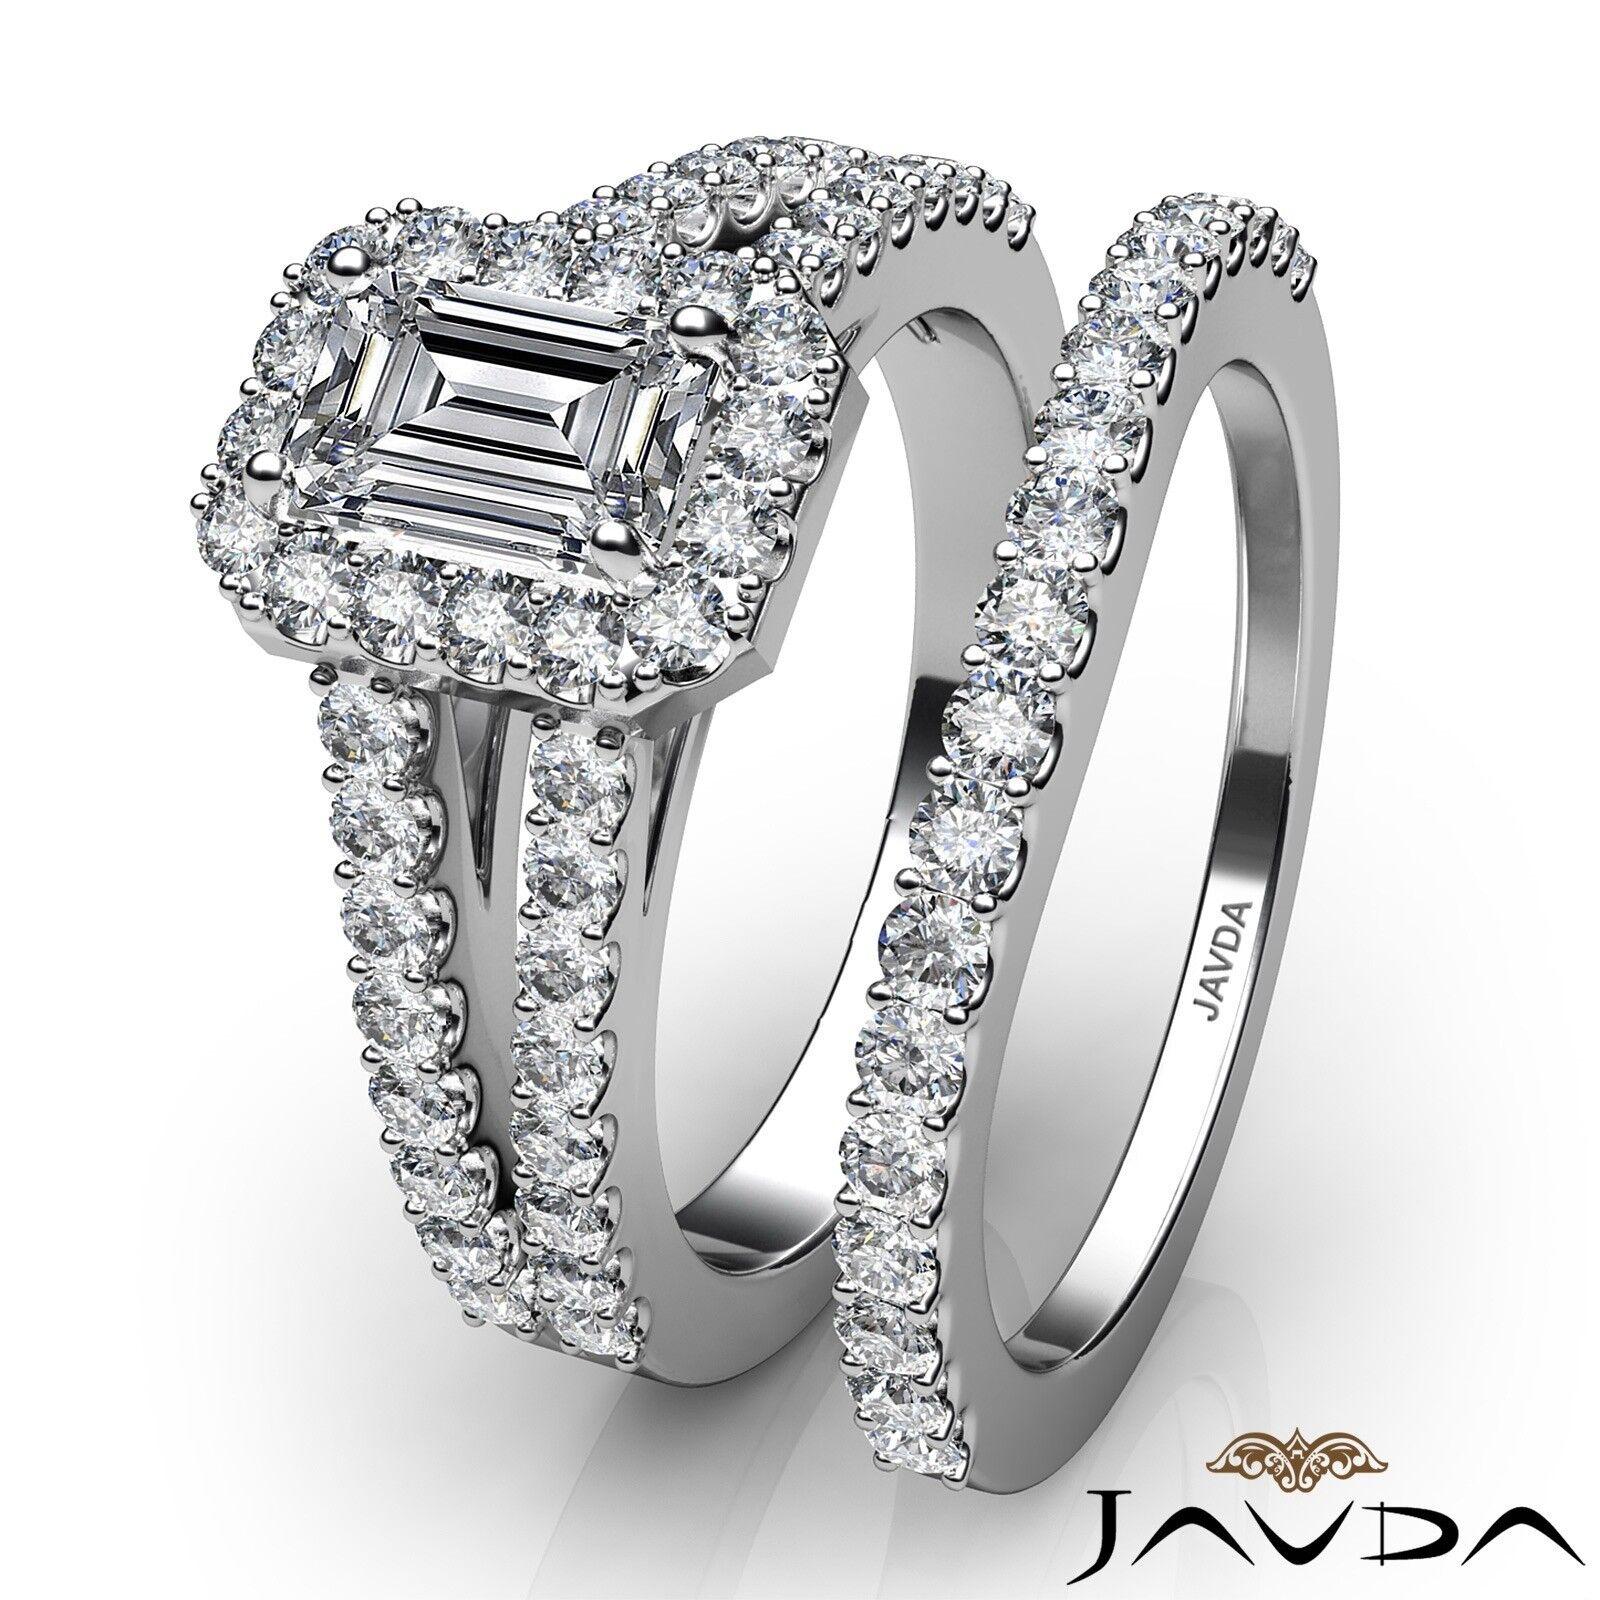 1.75ctw Halo Sidestone Bridal Emerald Diamond Engagement Ring GIA H-VS2 W Gold 3